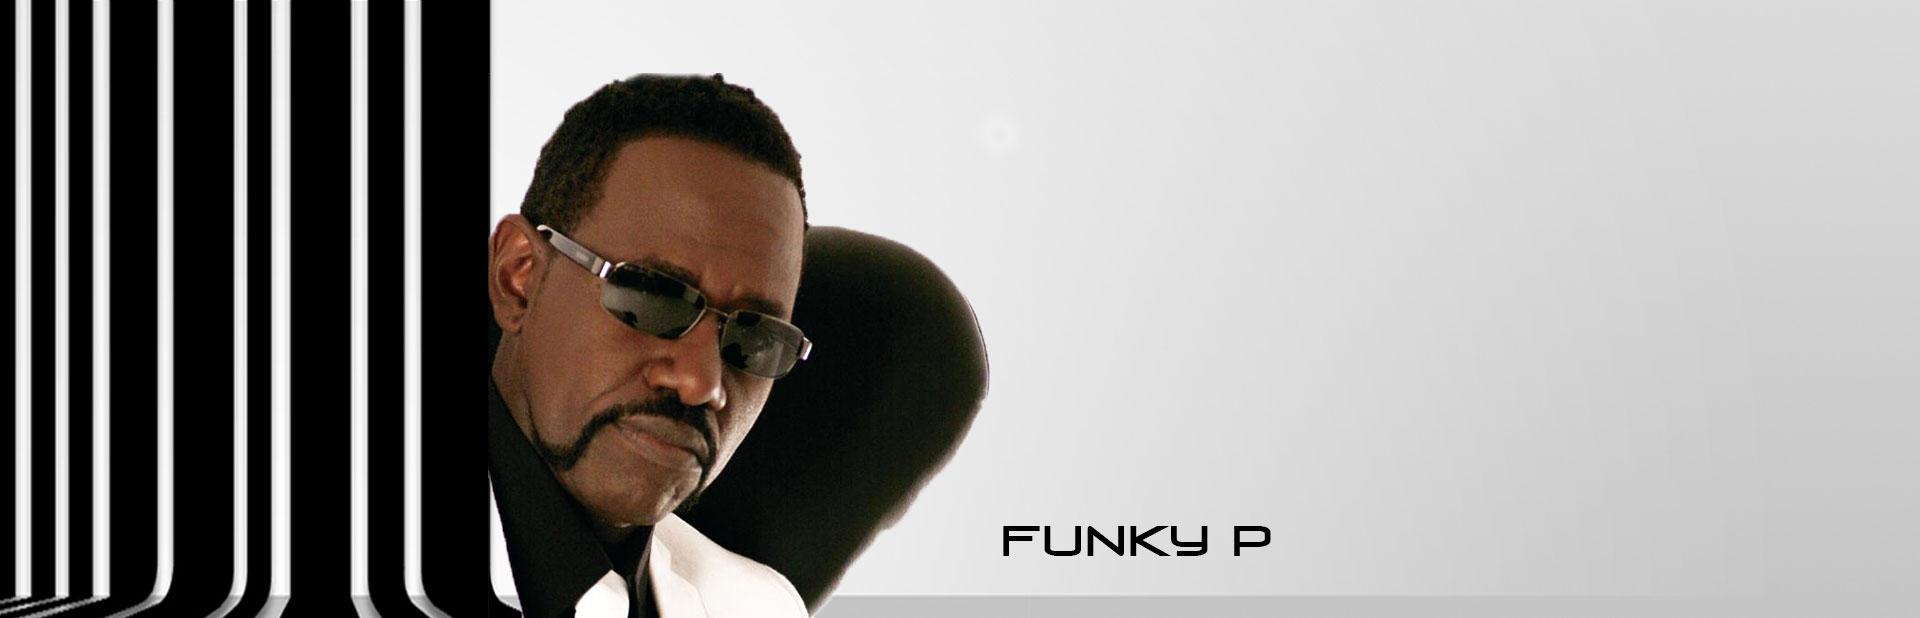 Funky p